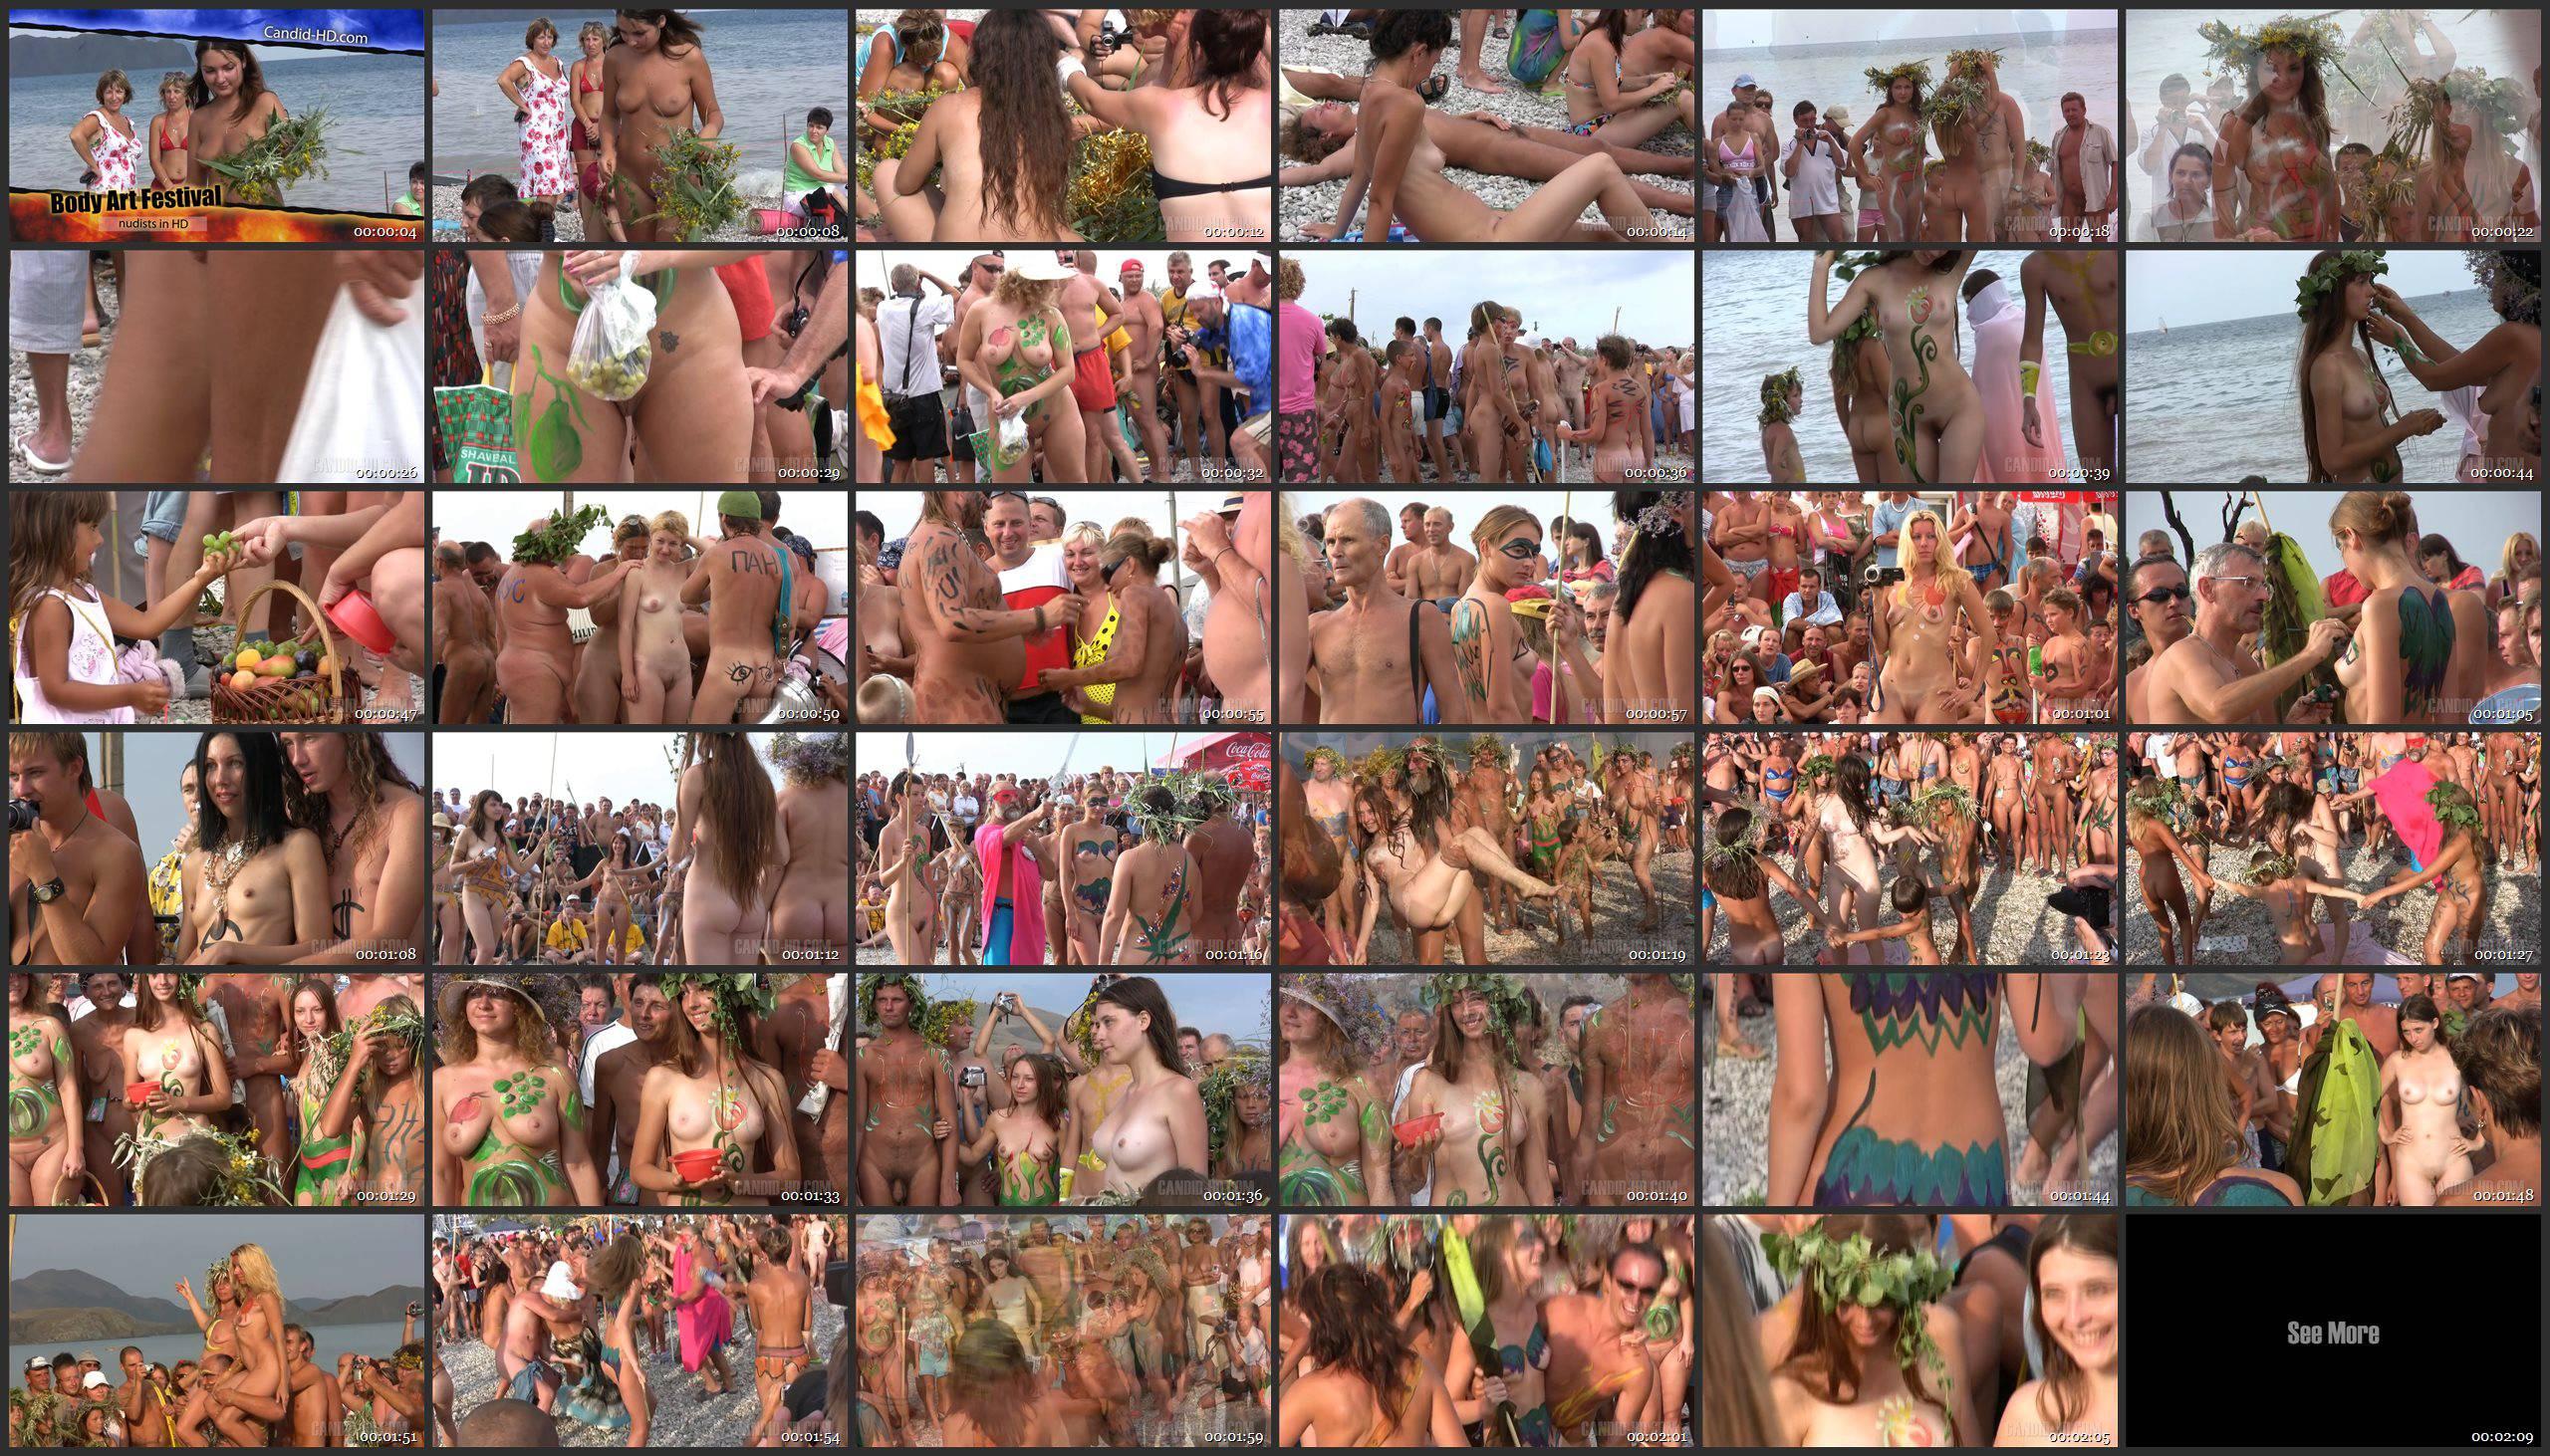 Body Art Festival - Thumbnails